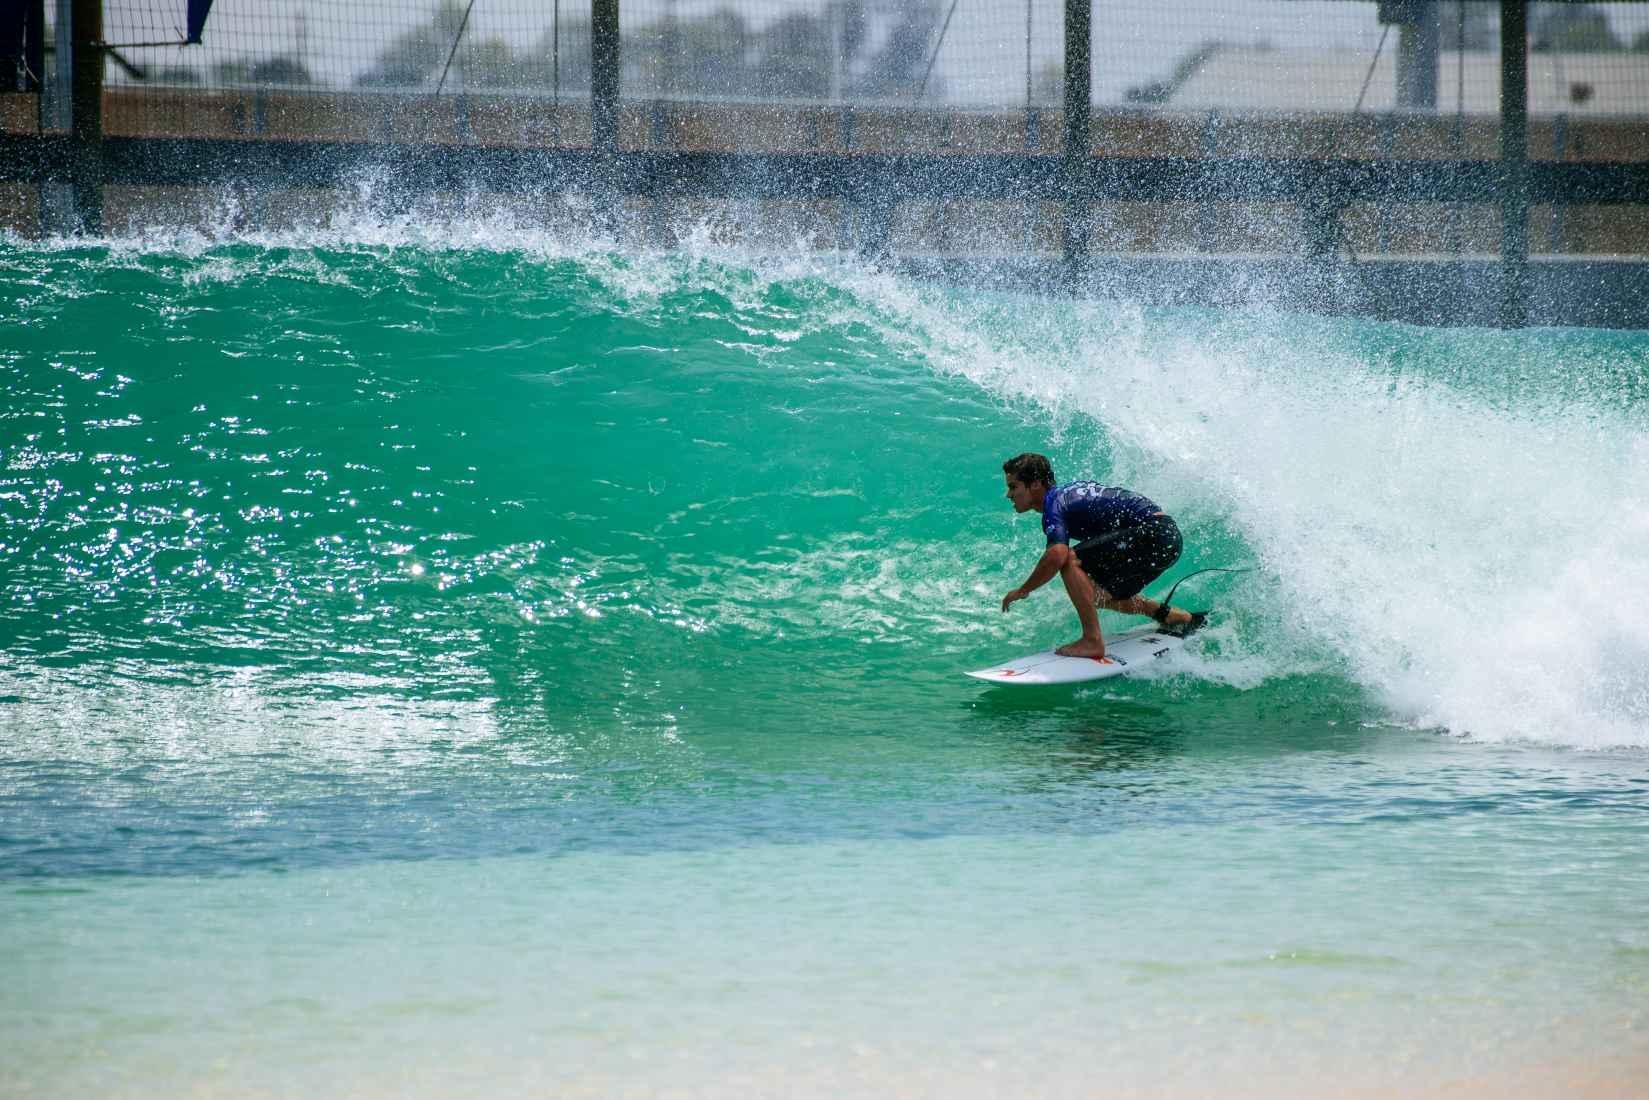 surf30 surf ranch pro 2021 wsl surf Cibilic M Ranch21 PNN 2758 2